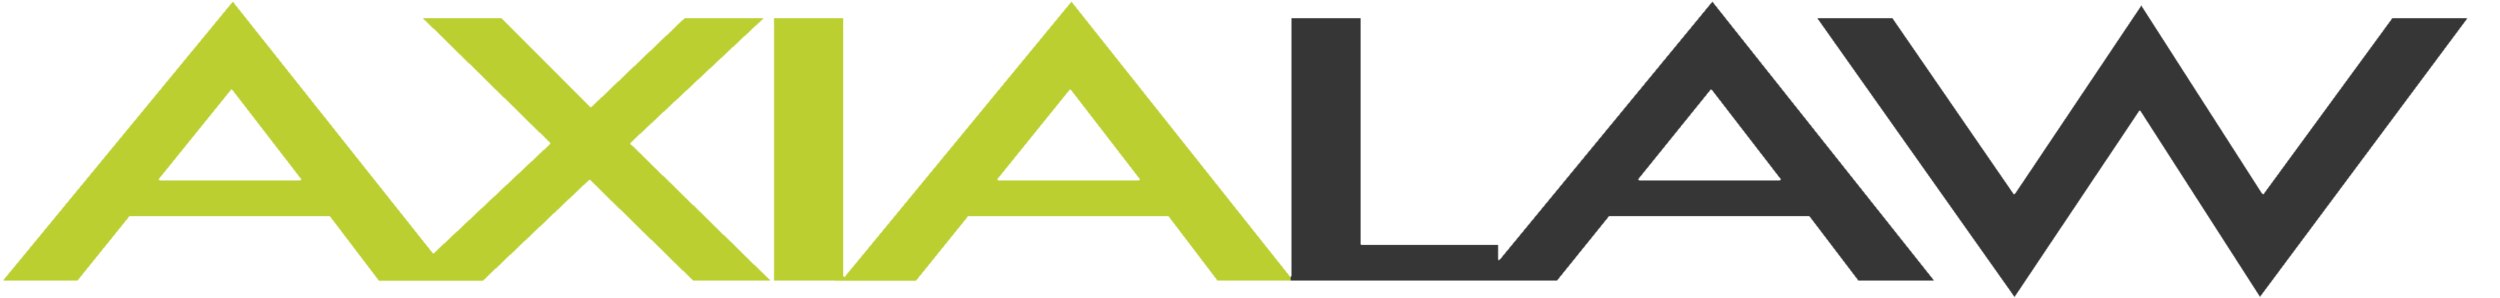 AXIA-WORD-LOGO-DARK.png